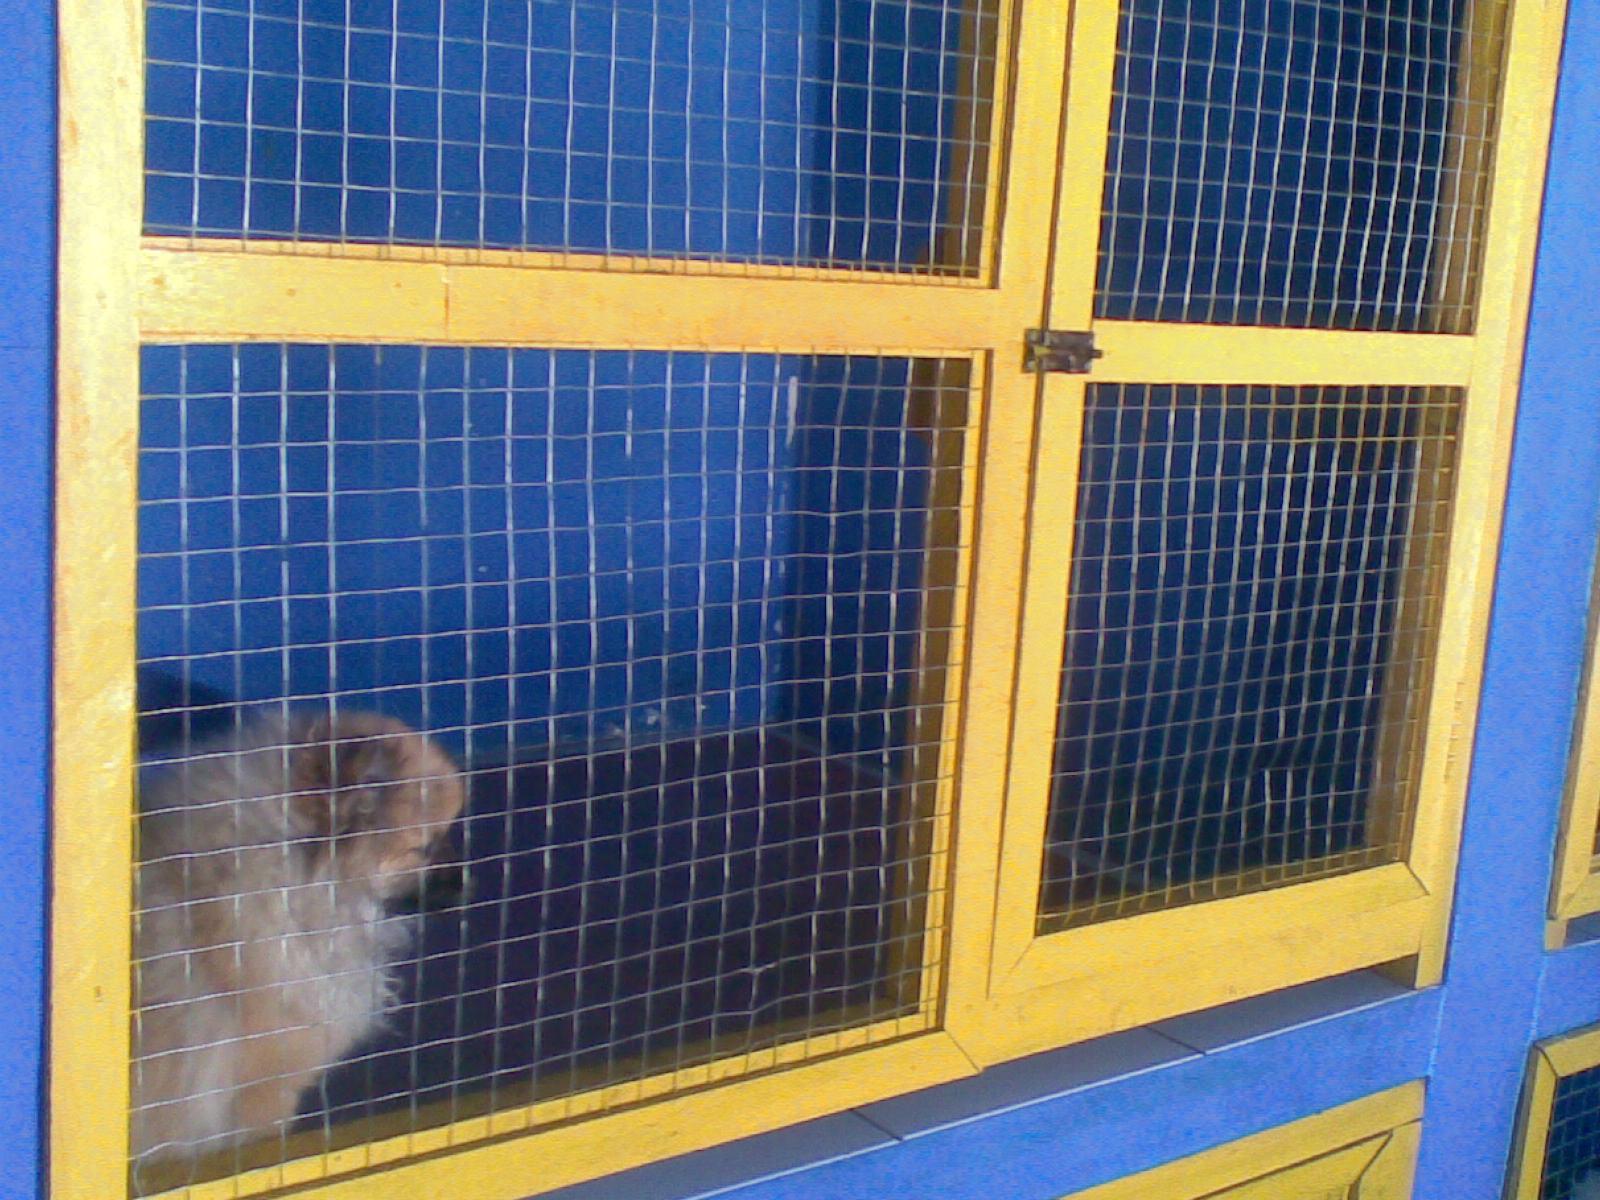 Gambar 2 Kandang Permanen Untuk Anjing Ukuran Kecil Toy